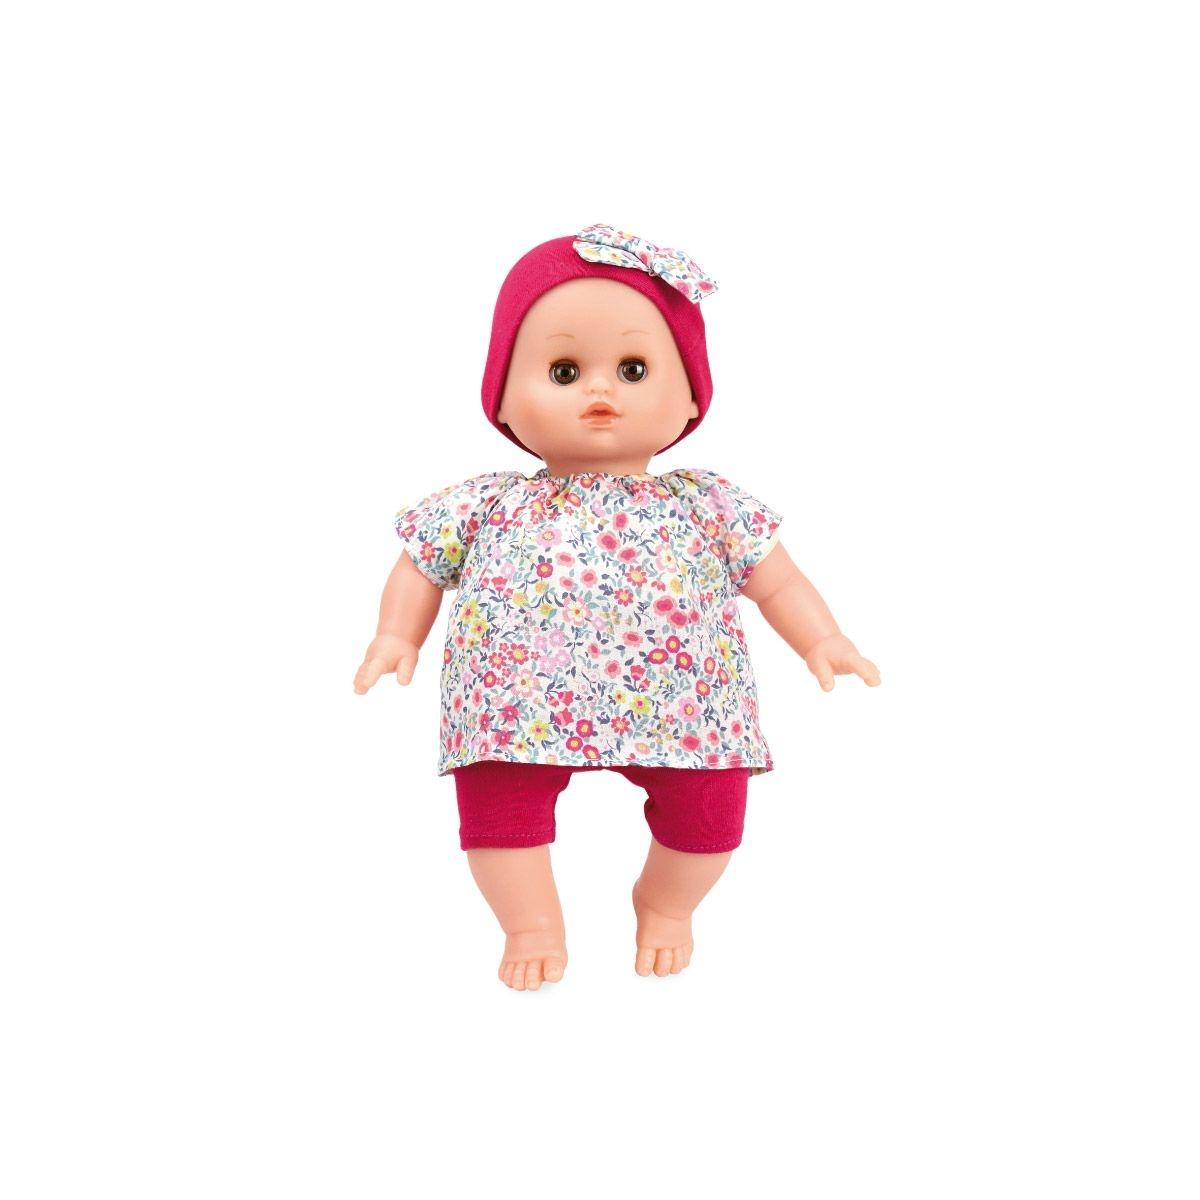 Bébé Petit Câlin 28 cm - Ecolo doll - Habillage Anémone